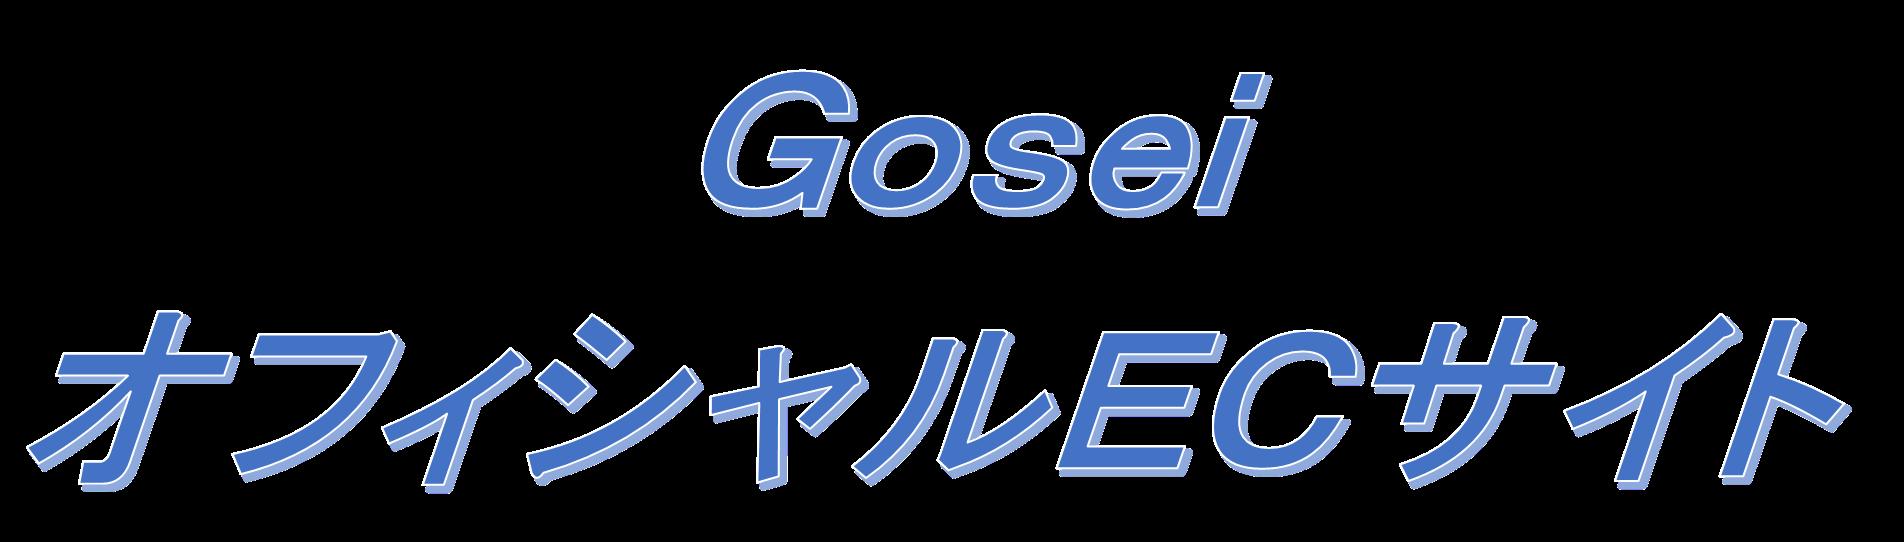 GoseiオフィシャルECサイト